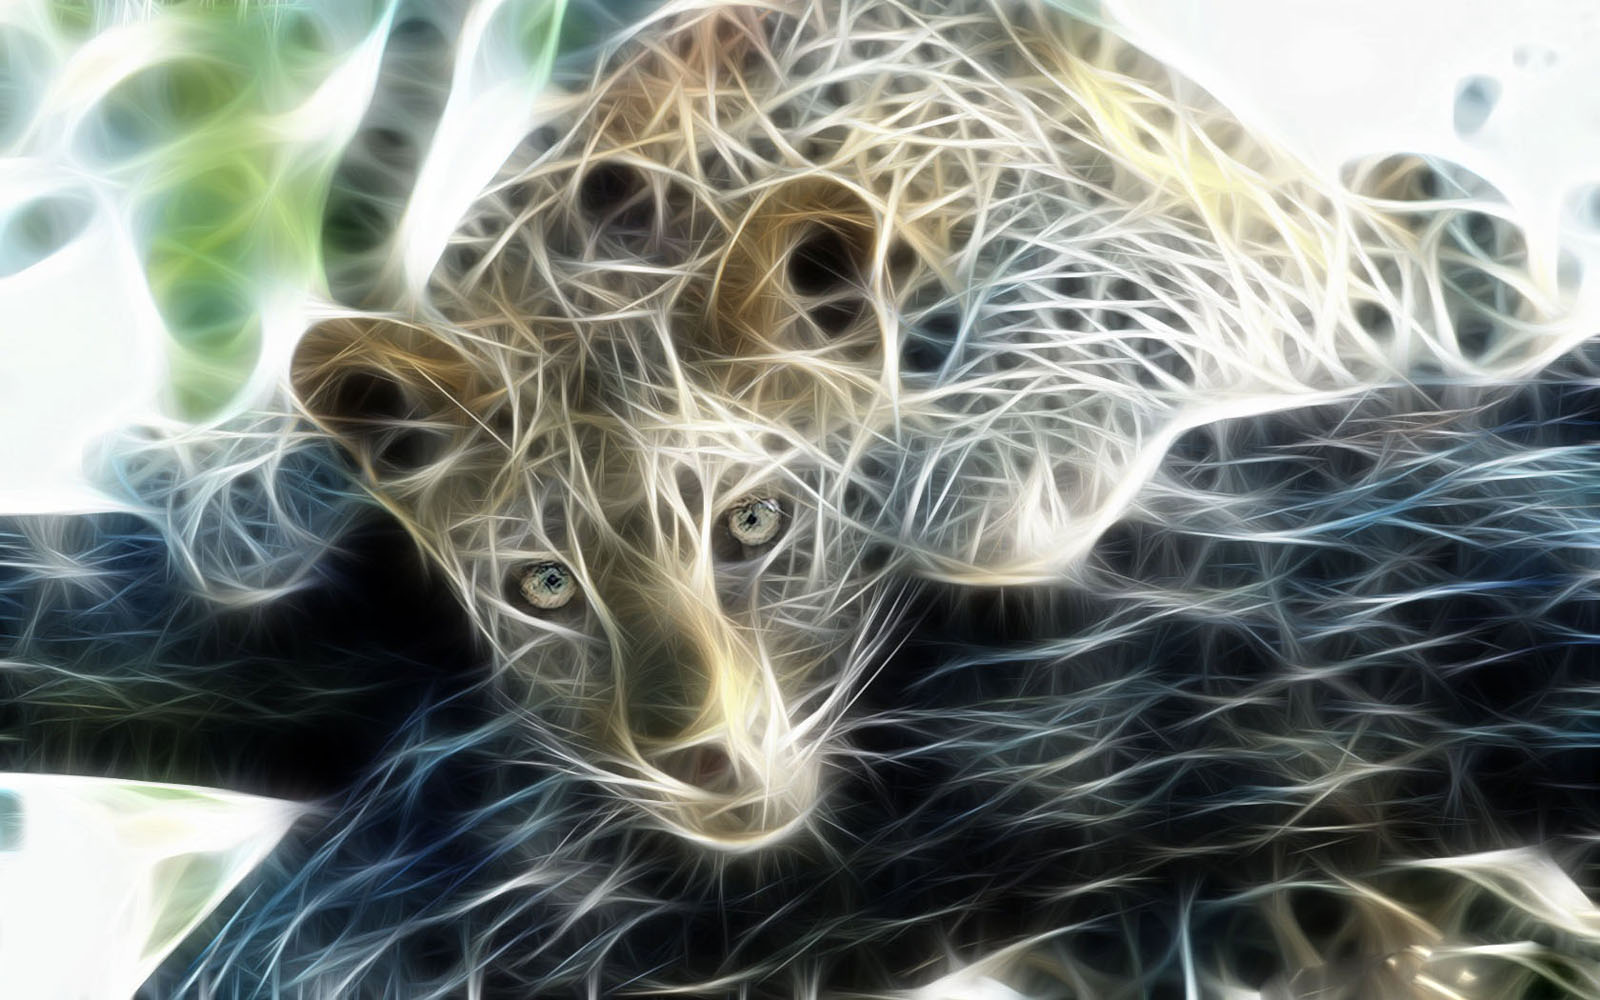 Digital Leopard Art Wallpapers: Wallpapers: Leopard 3D Wallpapers